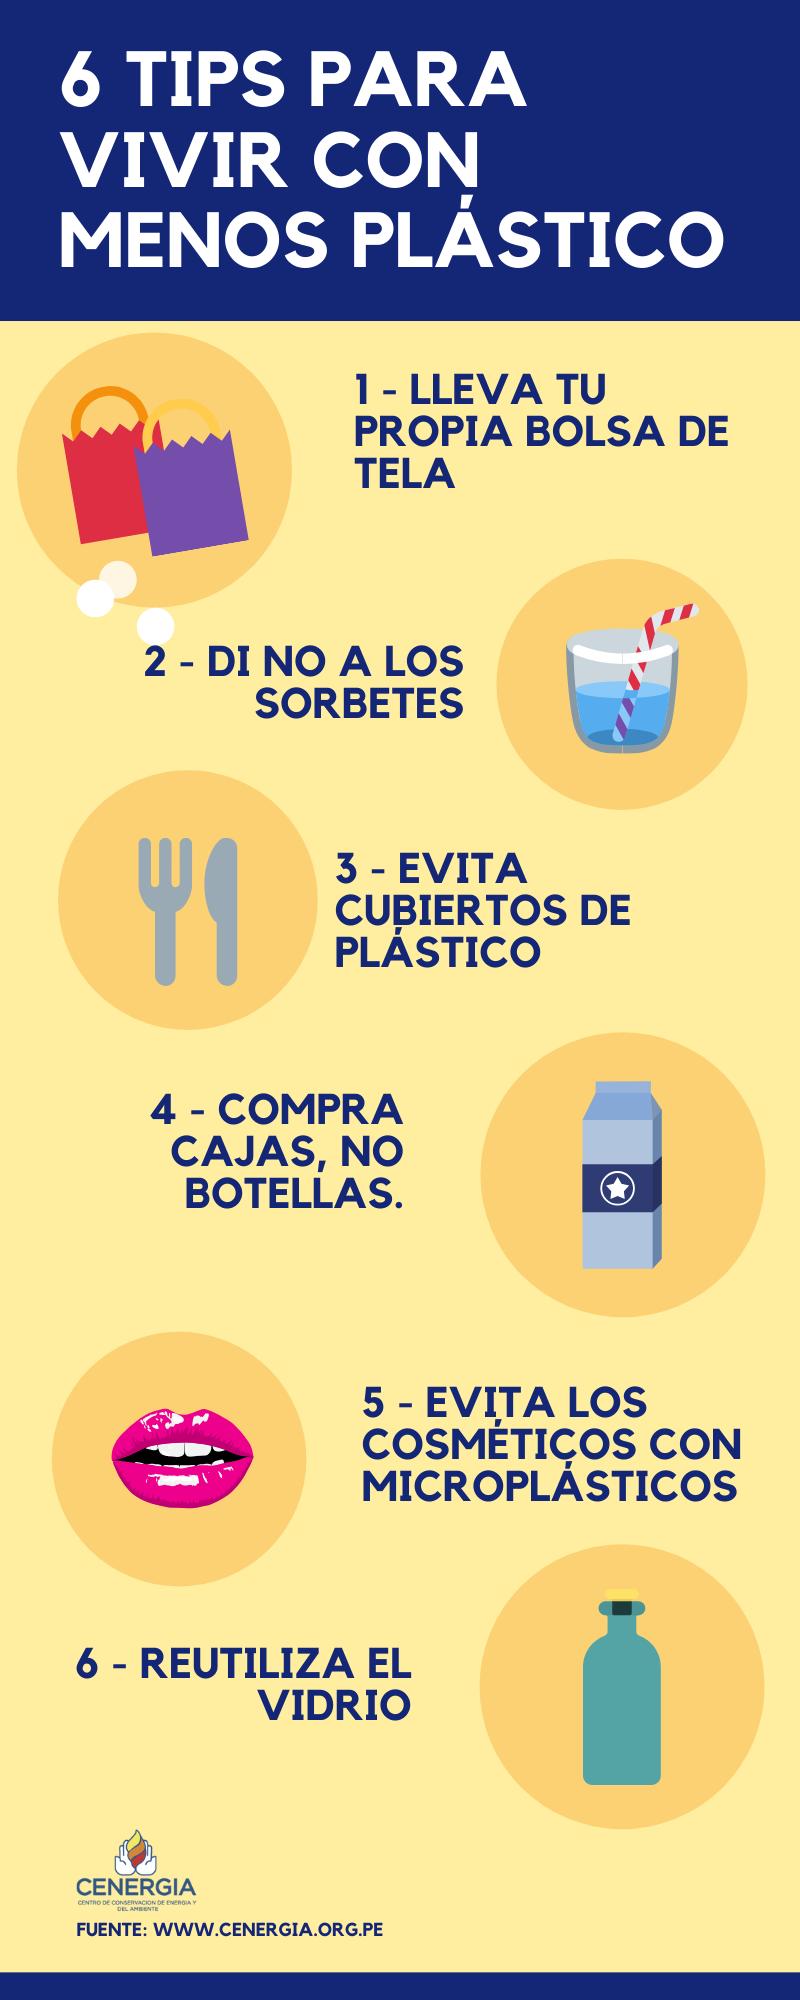 Bolsas Plásticas Biodegradables En Perú Cenergia